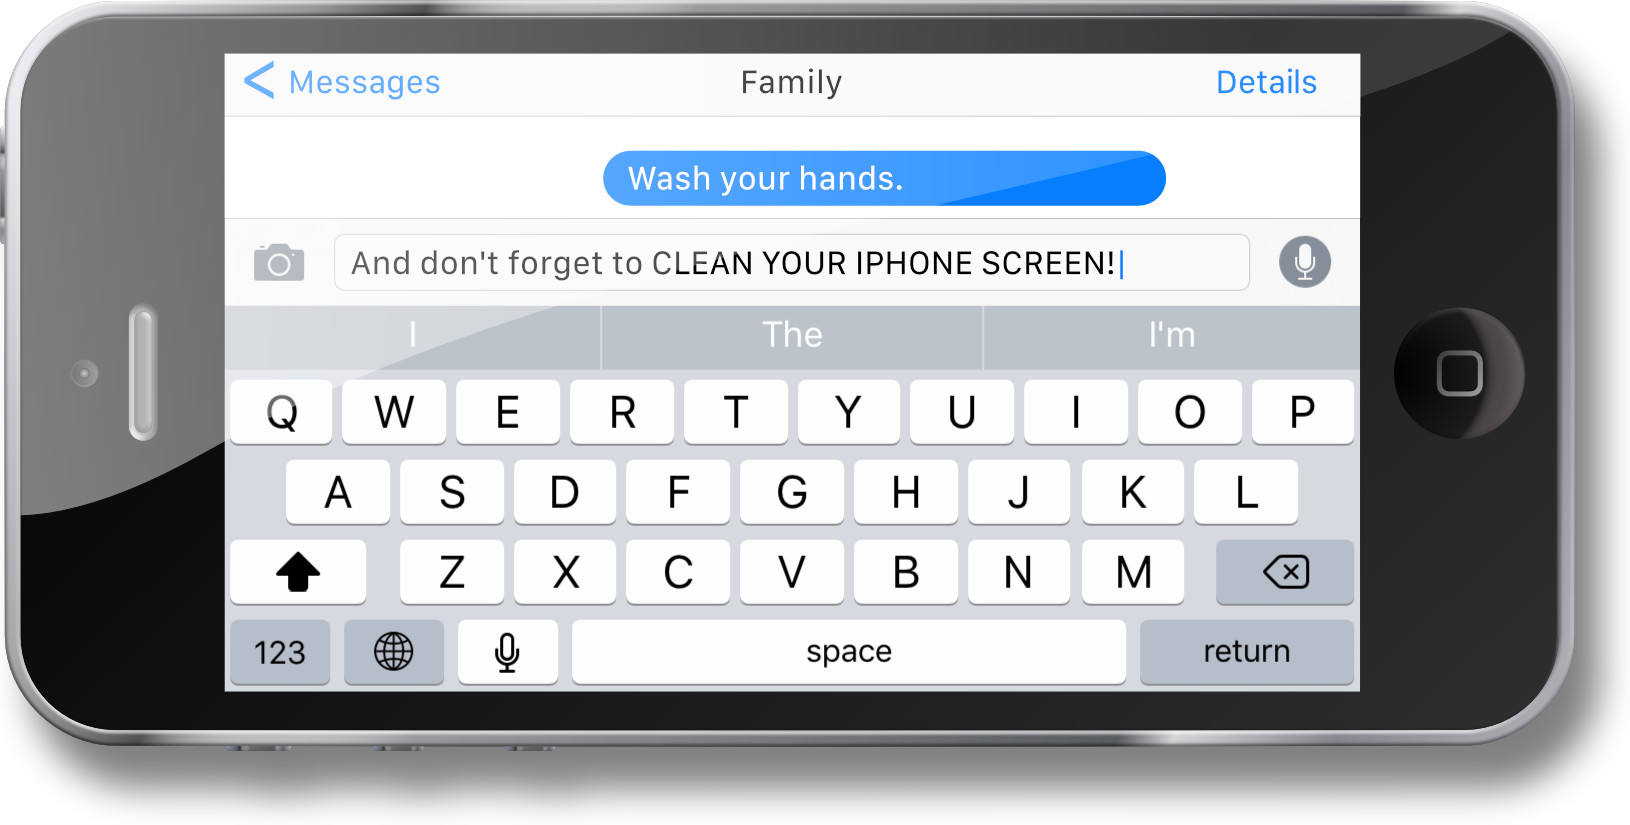 Wuhan Coronavirus COVID-19 - Mobile Device Screen Cleaning